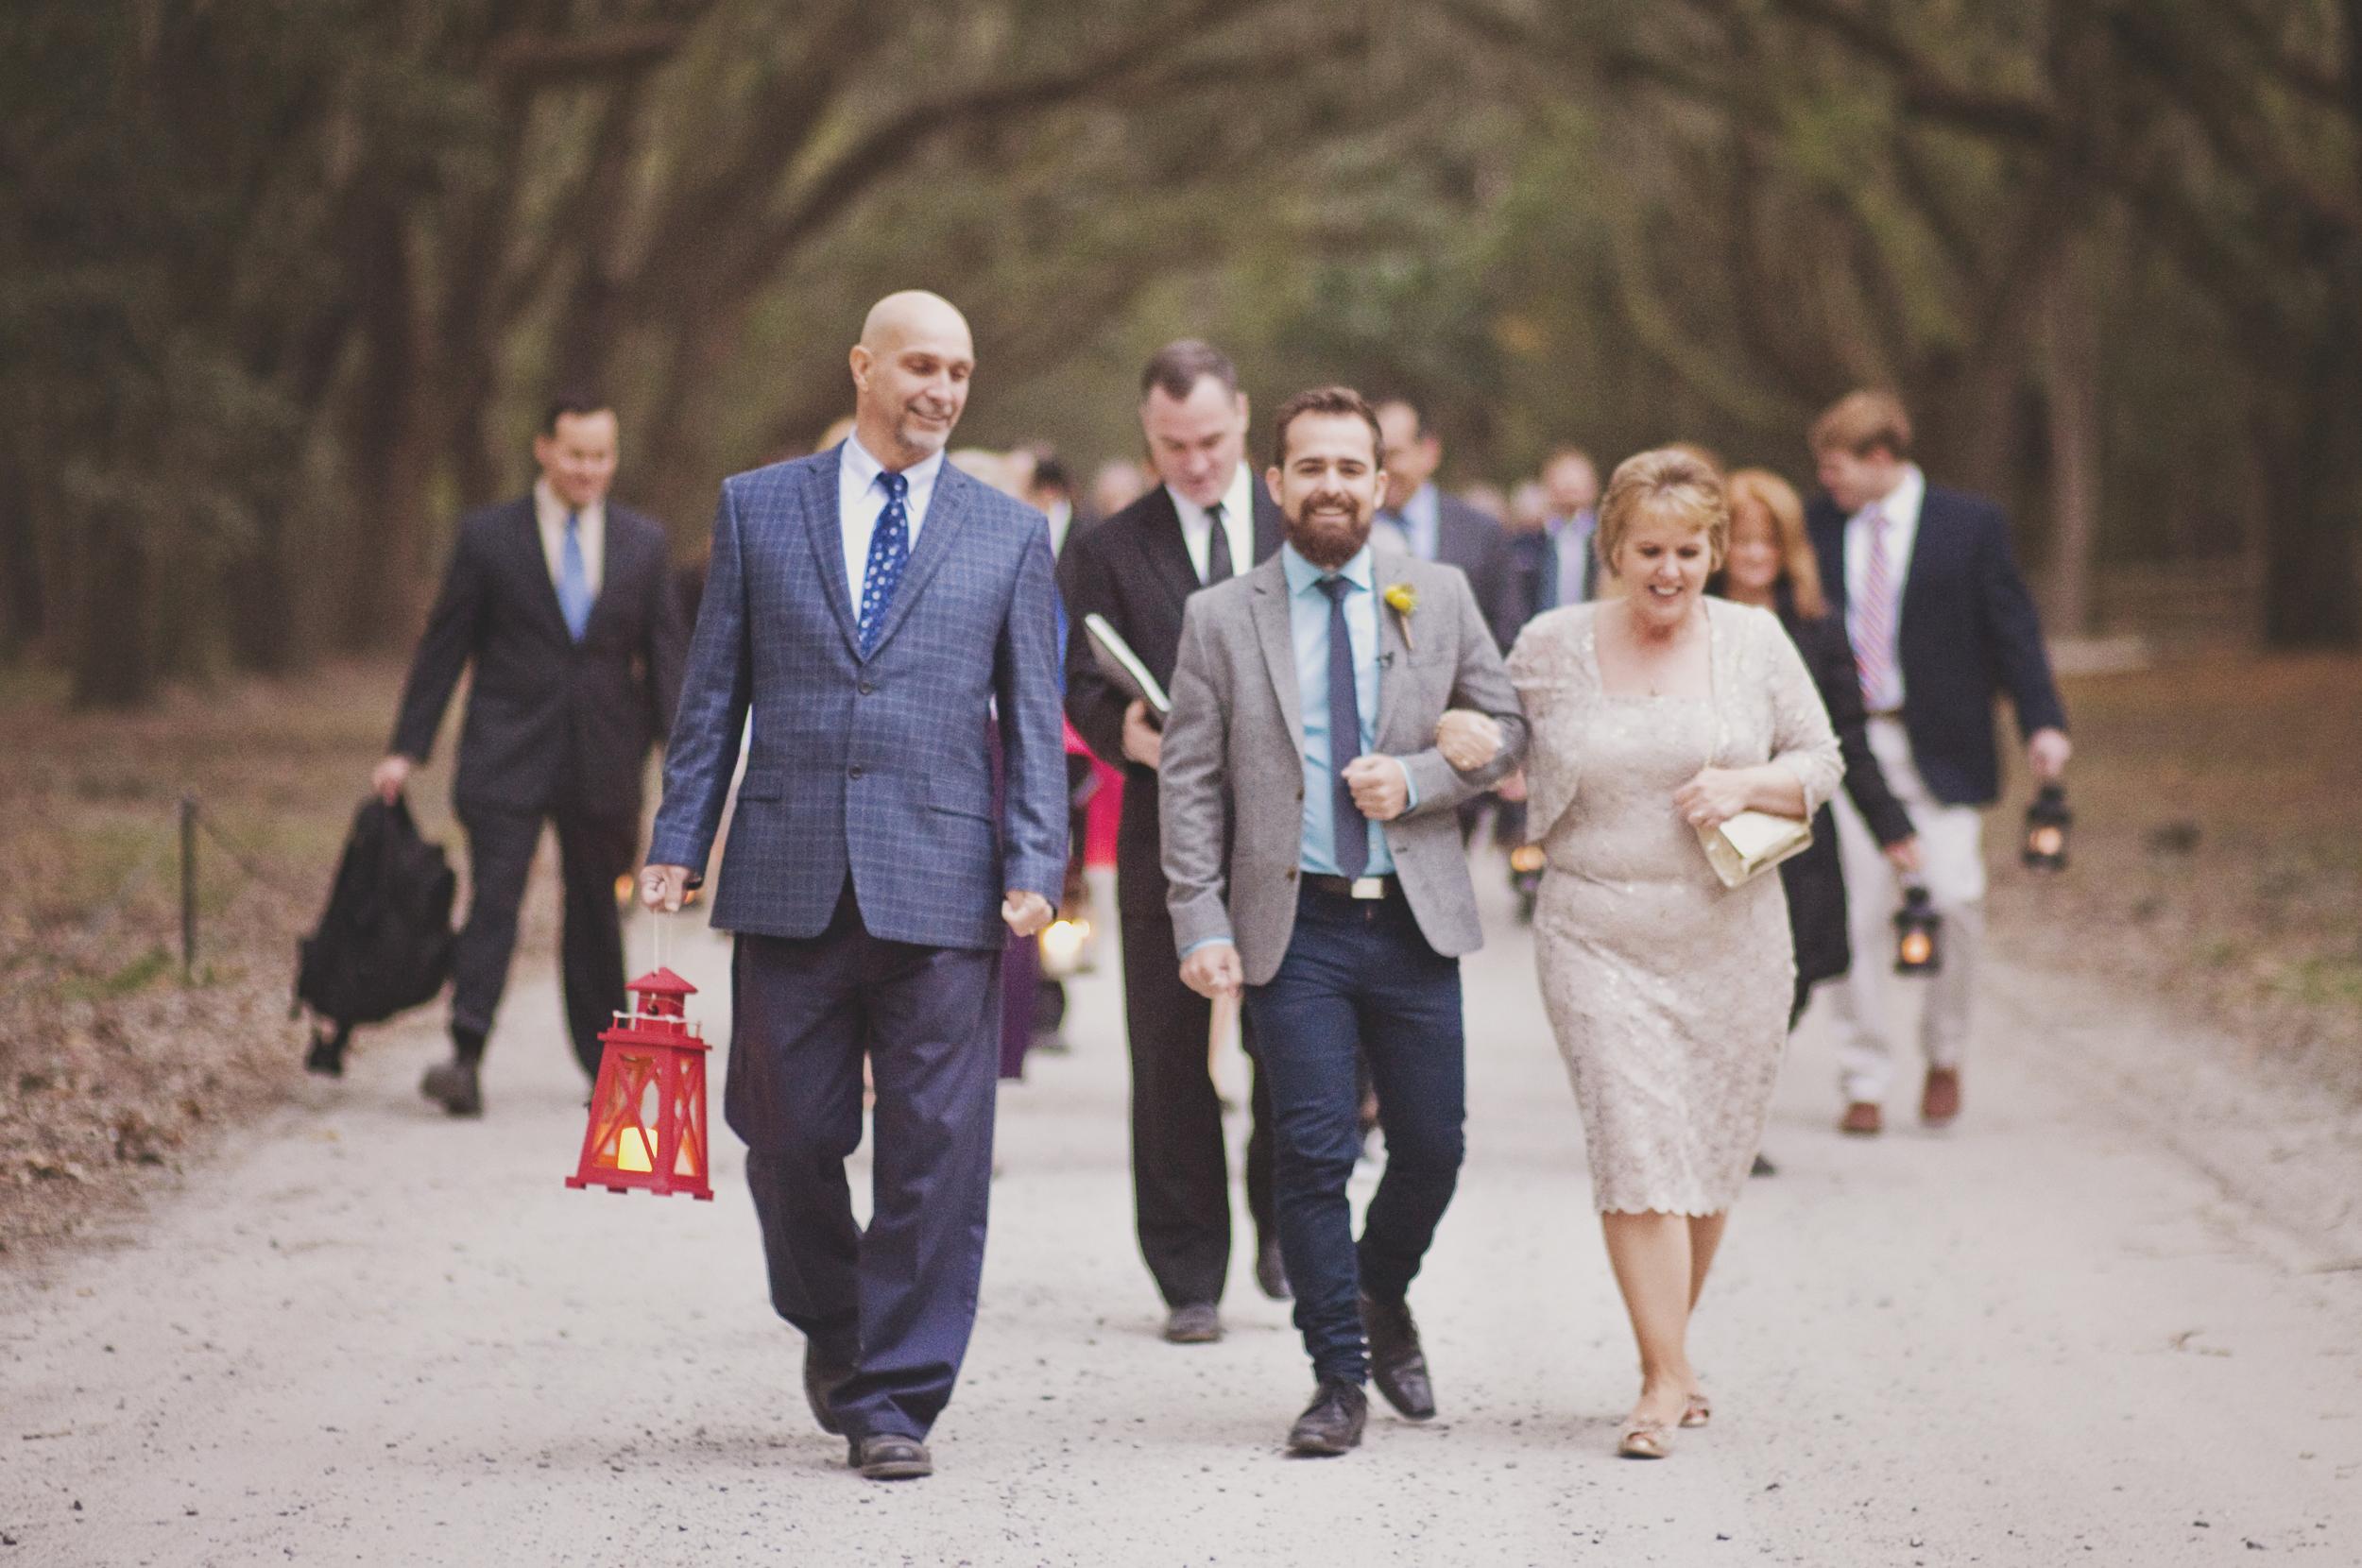 amber-and-david-ivory-and-beau-bridal-boutique-lytle-foto-savannah-wedding-dresses-savannah-wedding-planner-savannah-event-designer-savannah-weddings-wormsloe-wedding-cohens-retreat-wedding-indie-wedding-handmade-wedding-historic-26.jpg